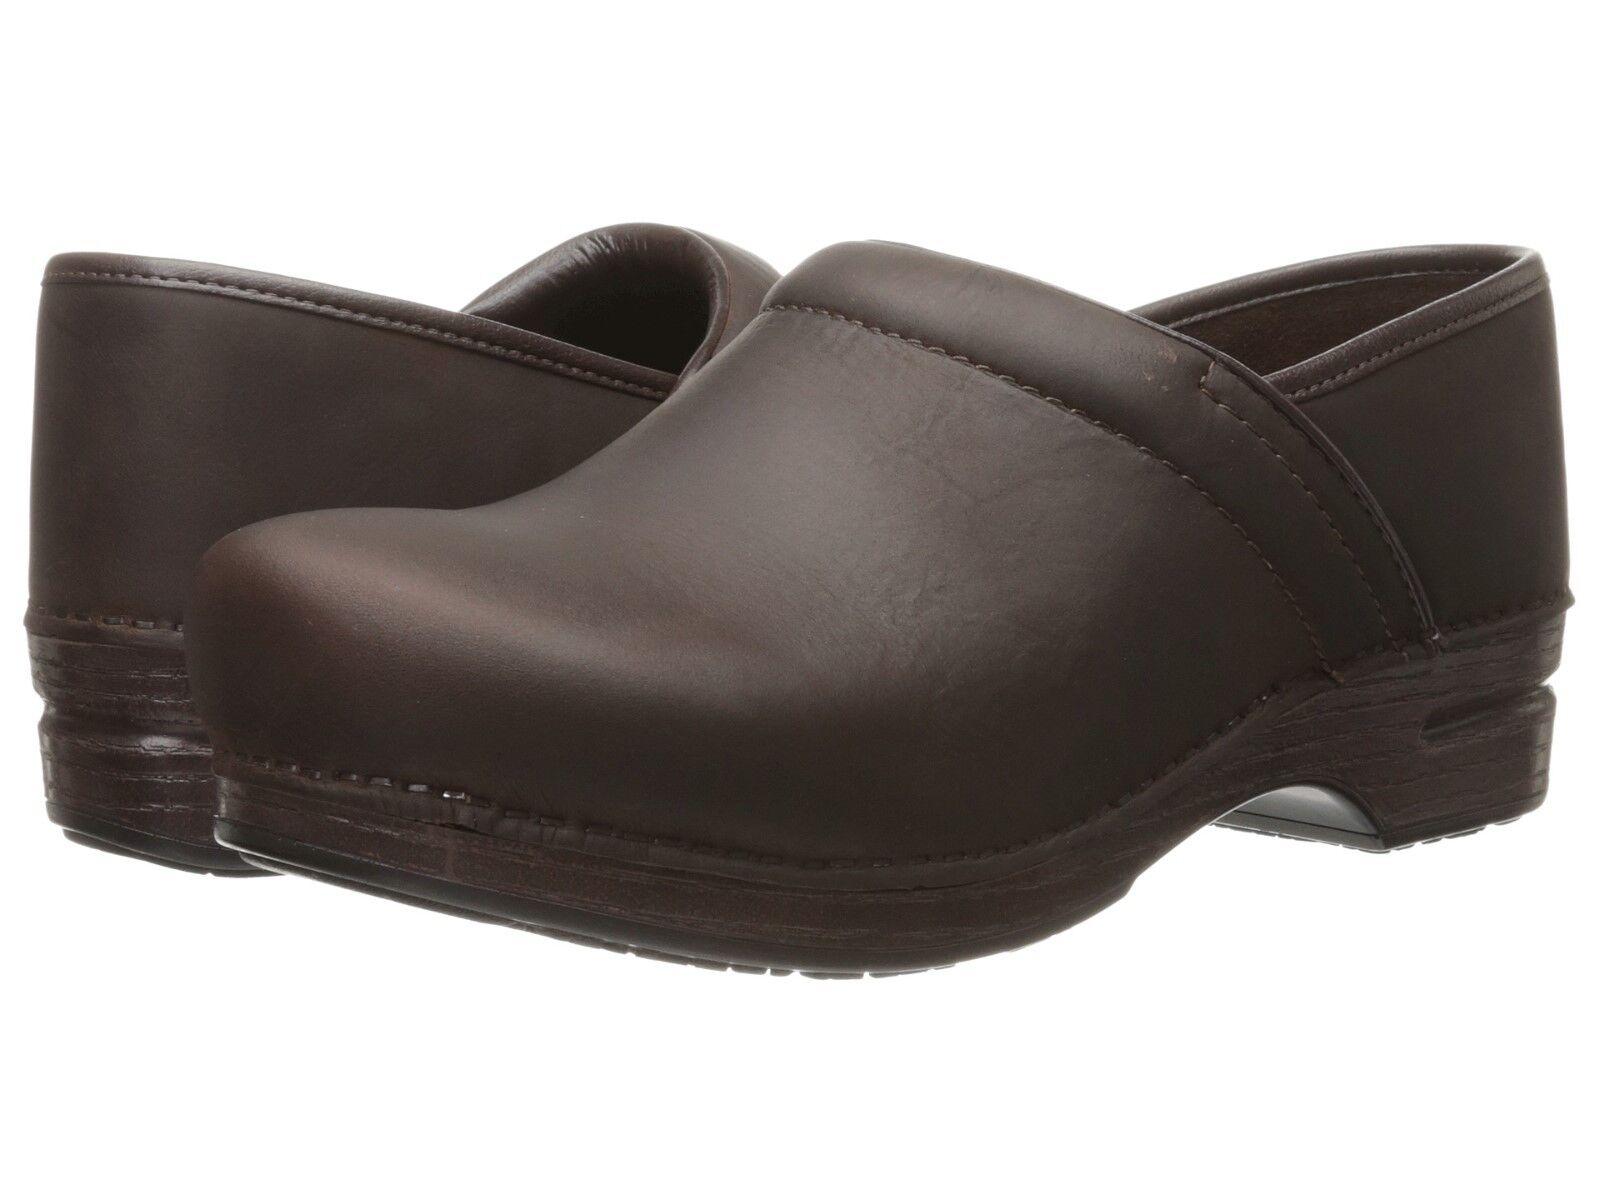 Men's Dansko Professional Pro XP Clogs Brown Oiled Leather